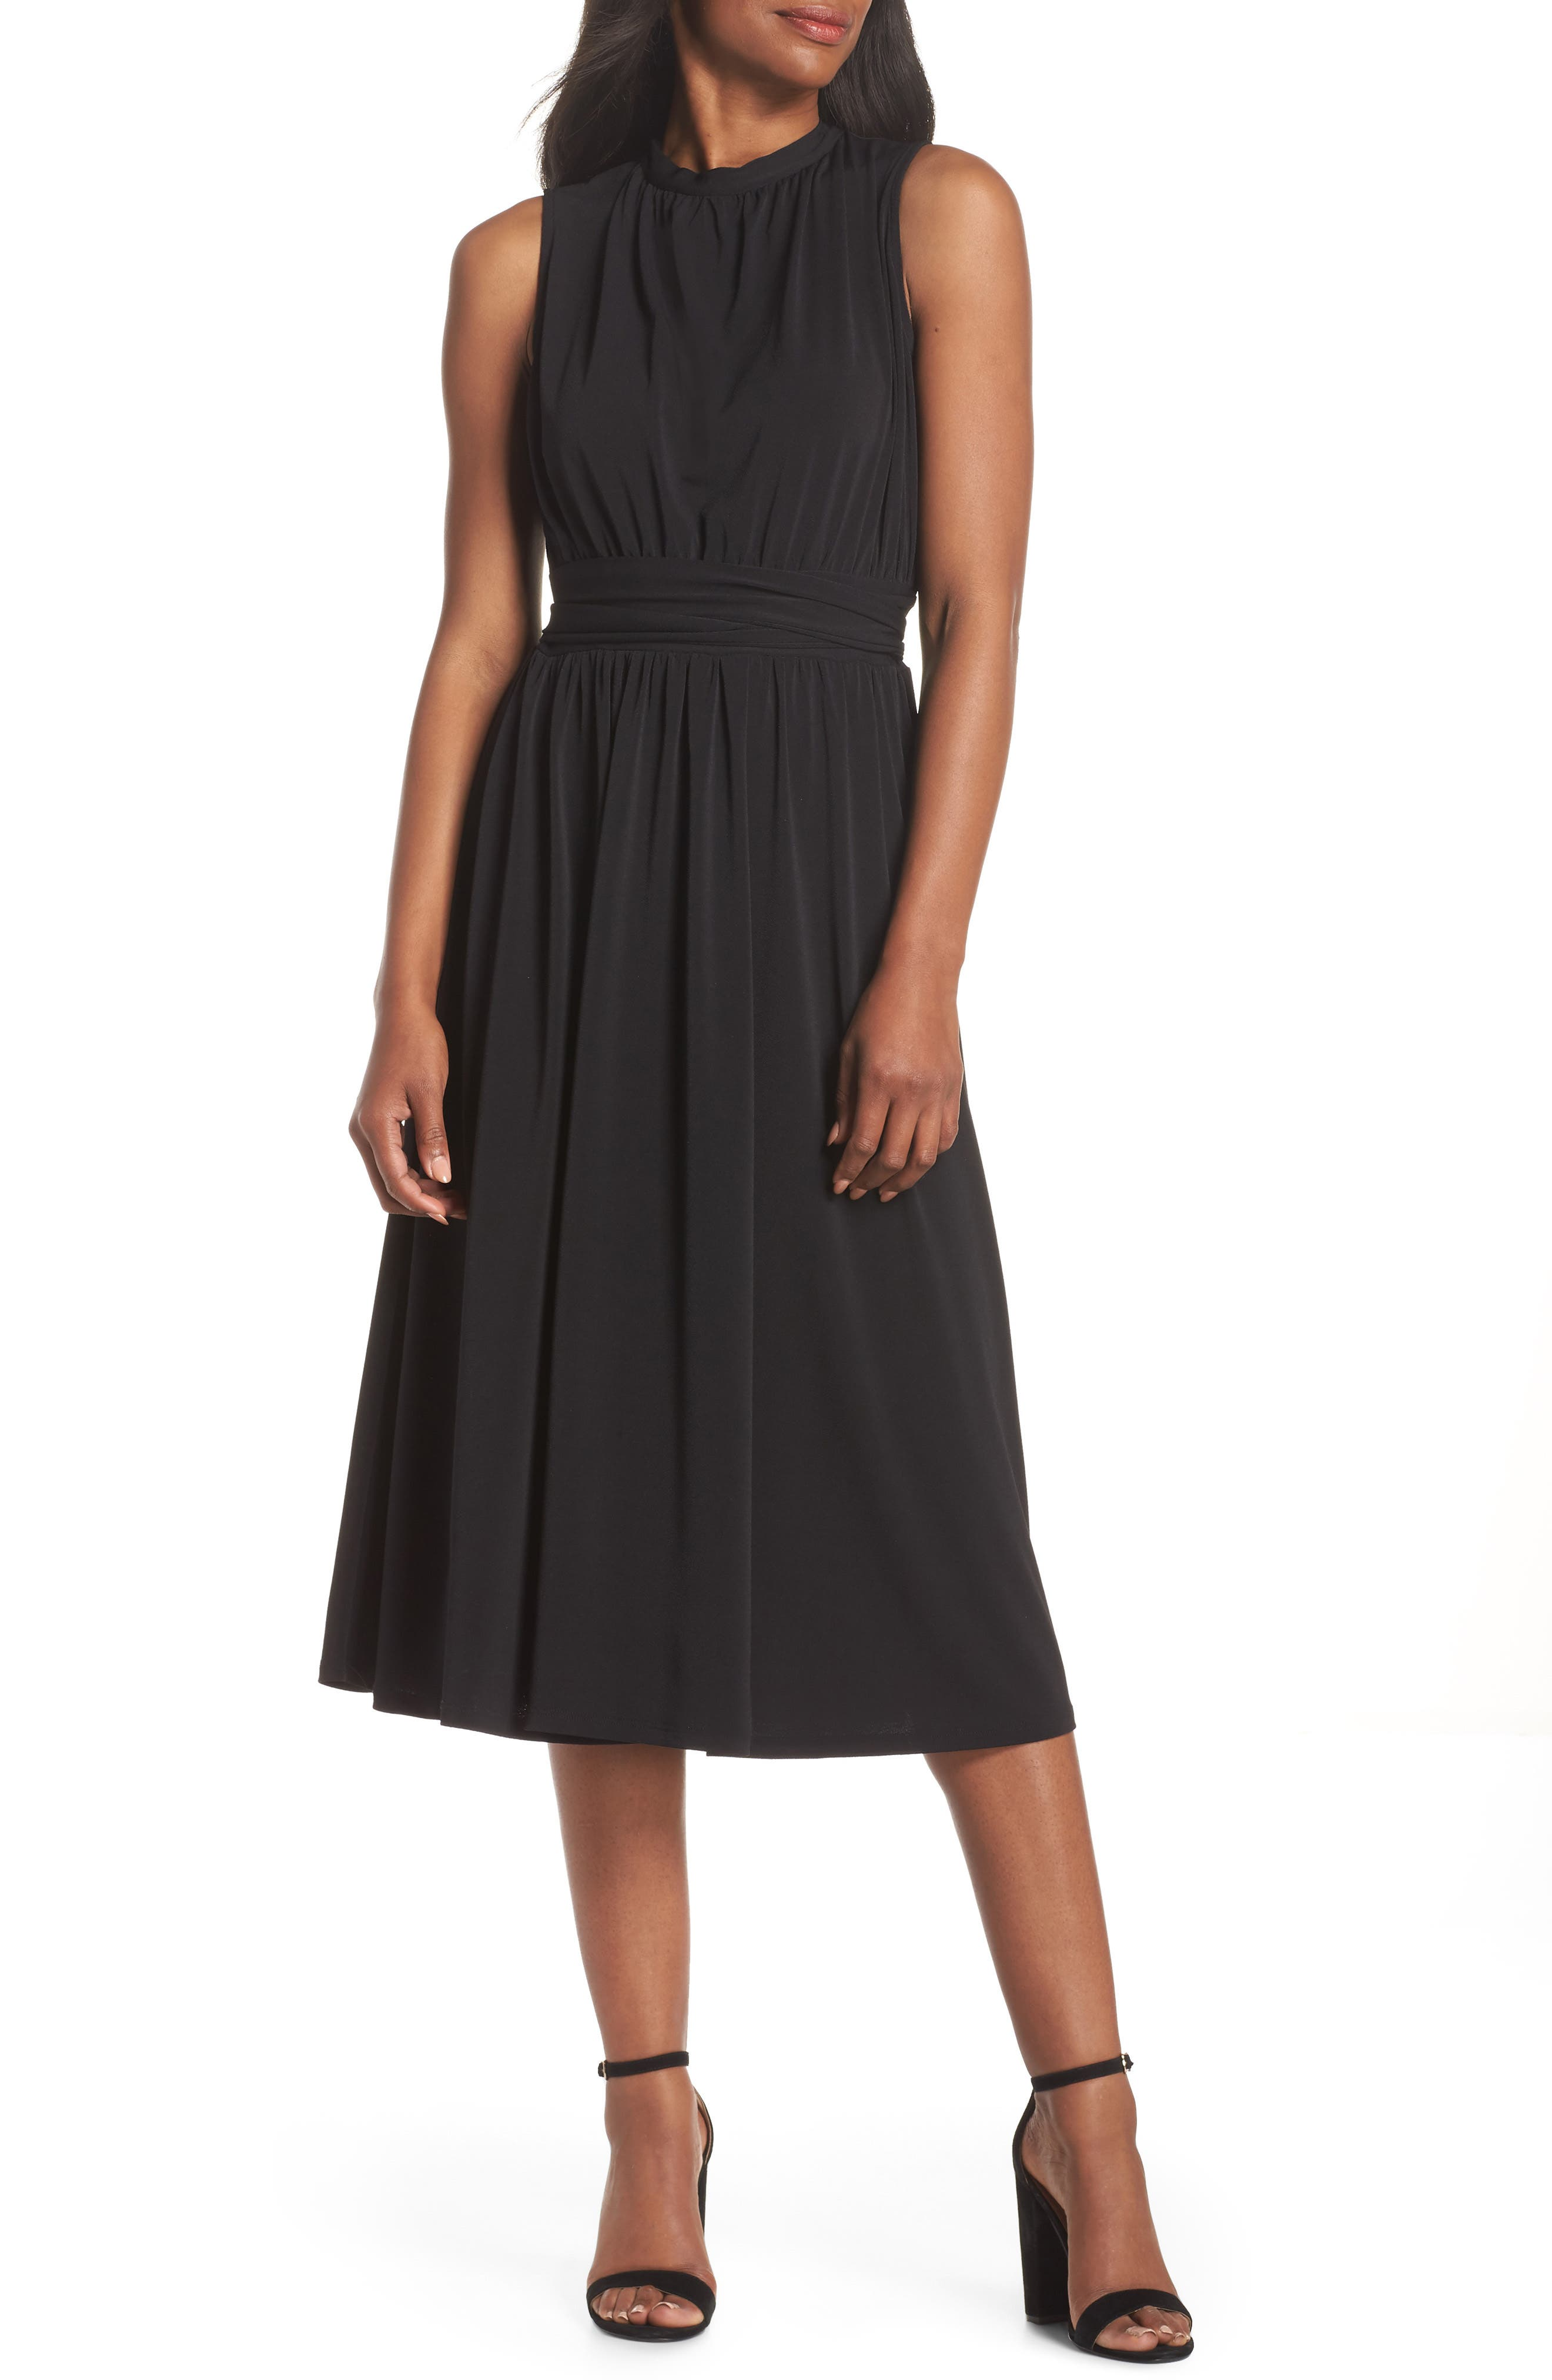 Leota Mindy Shirred Midi Dress, Black